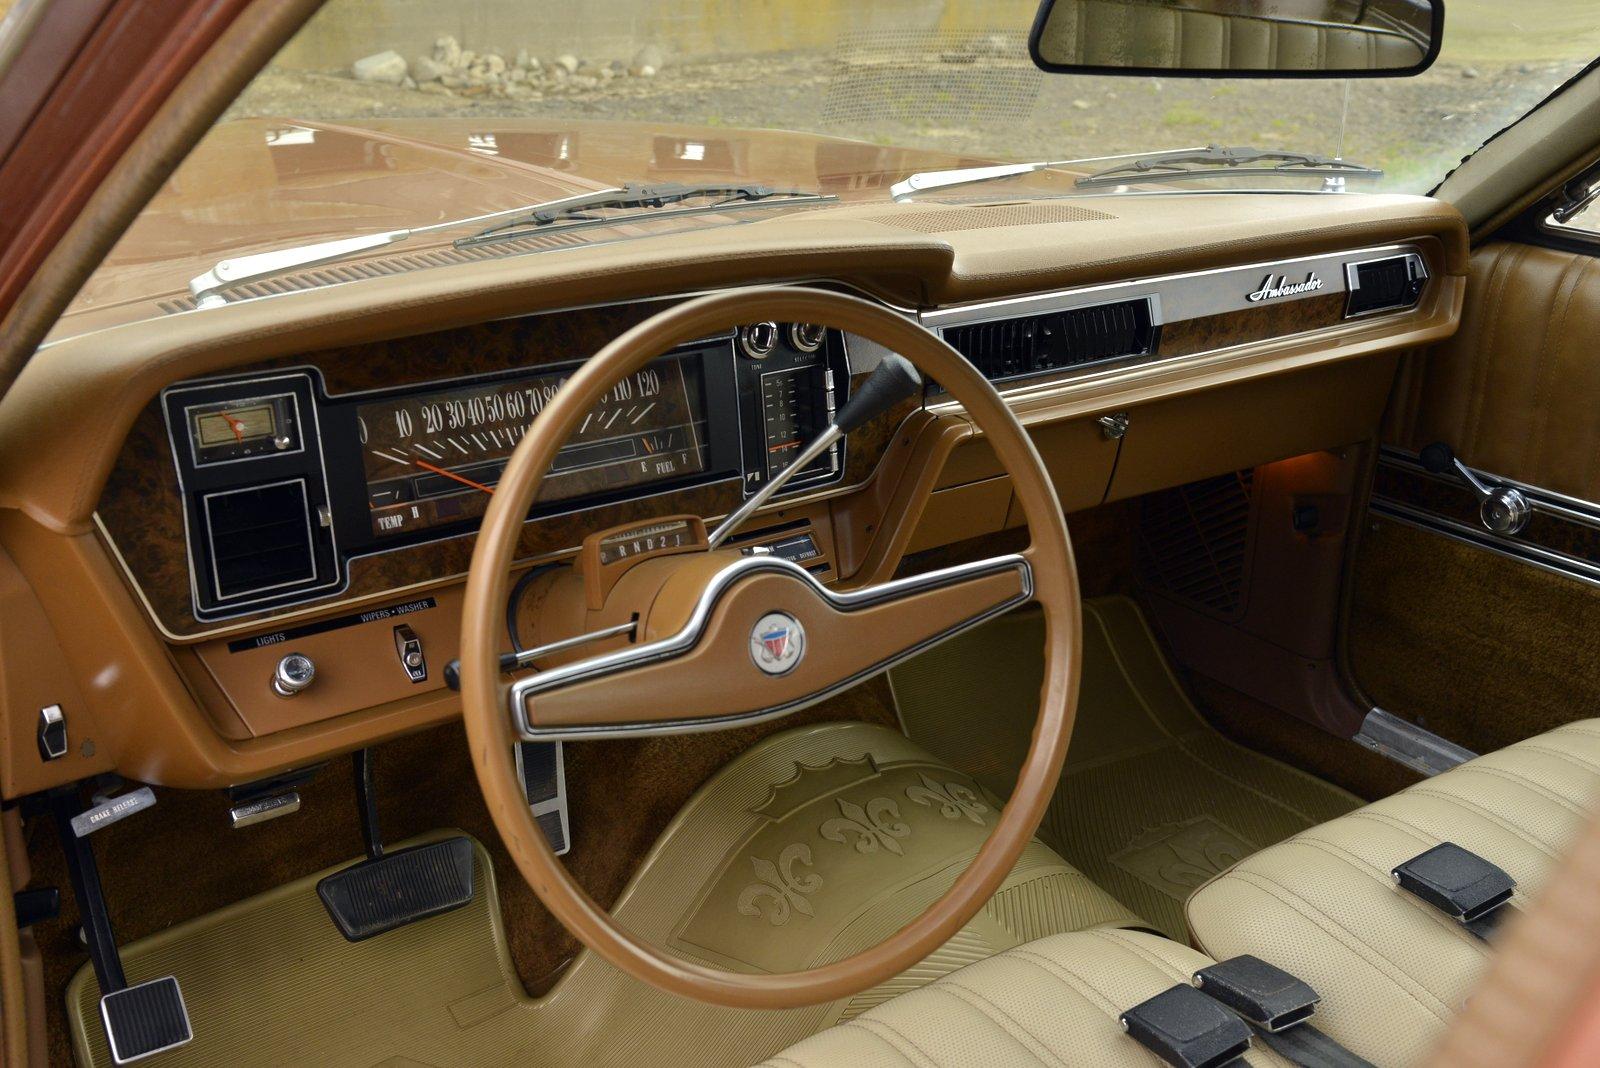 1972 AMC Ambassador Brougham Wagon steering wheel